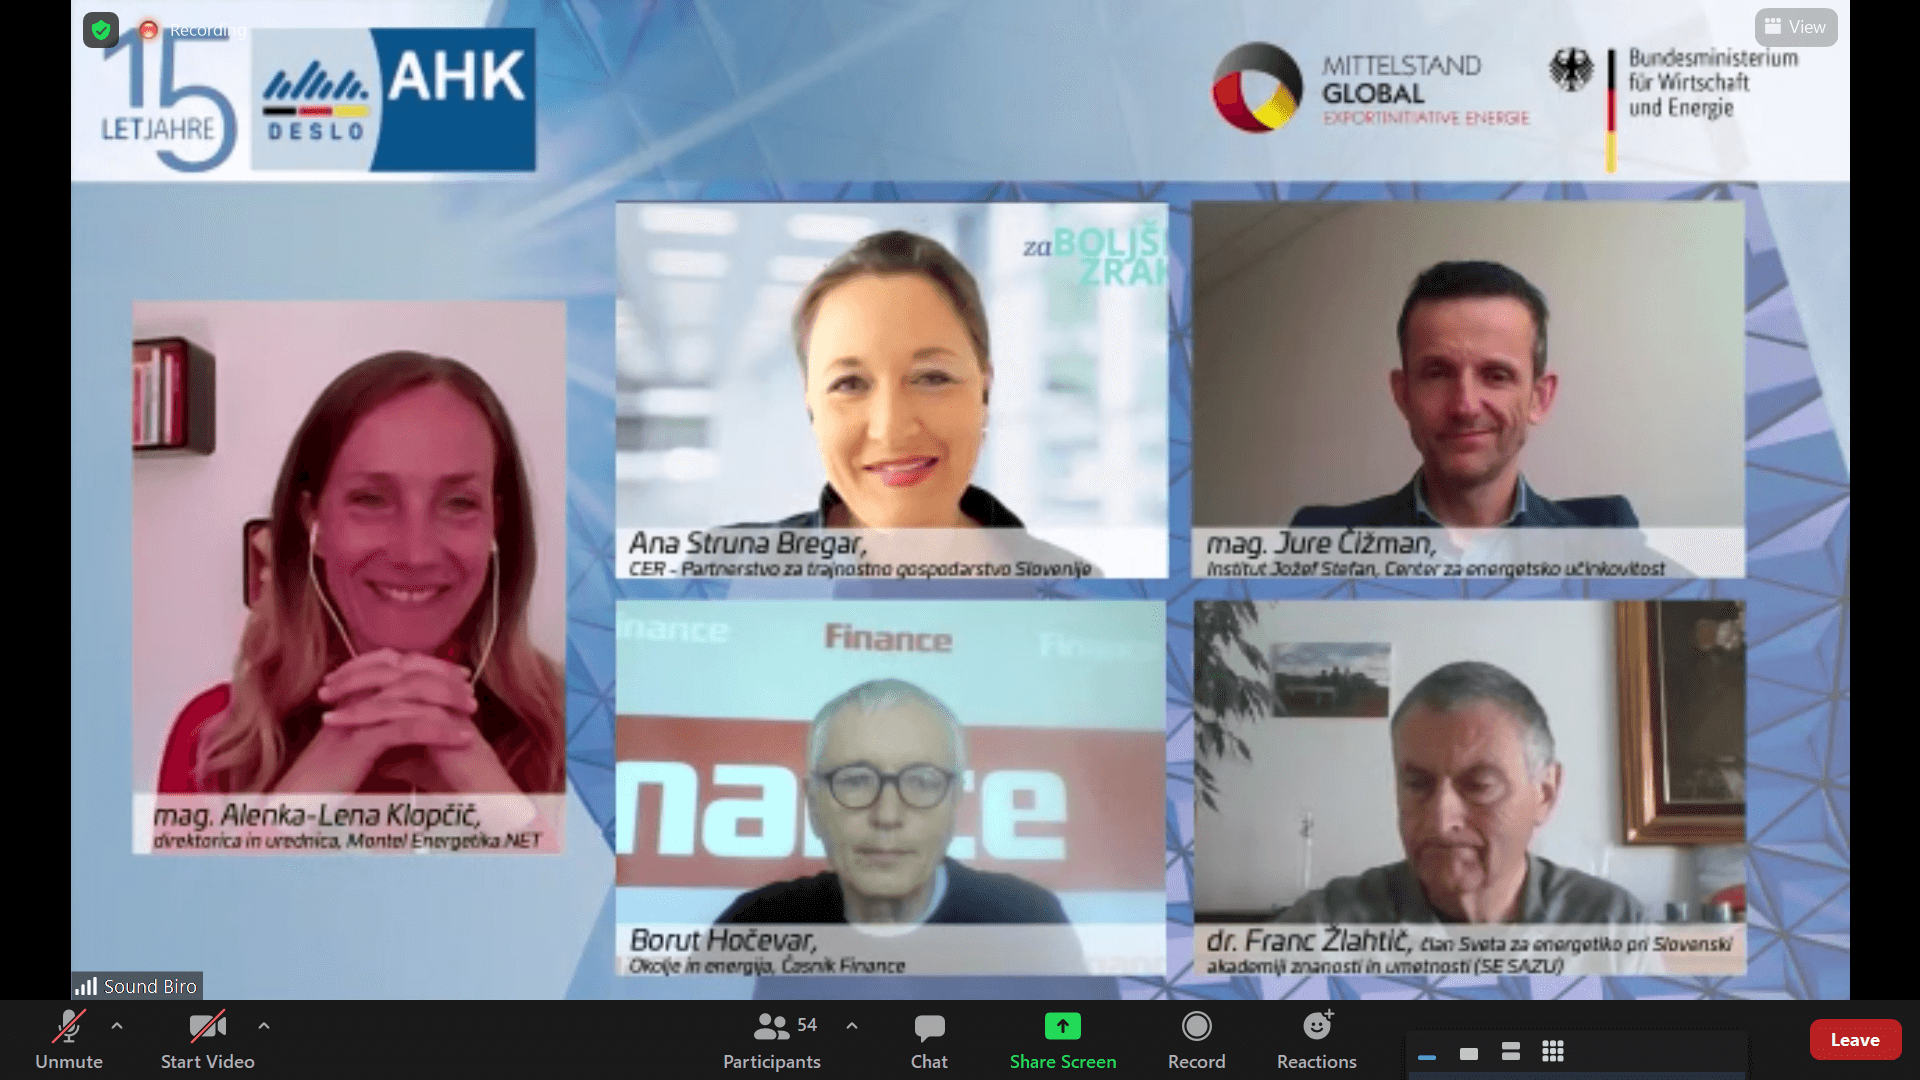 menerga-ahk-nagrada-energetsko-ucinkovit-projekt-zirija